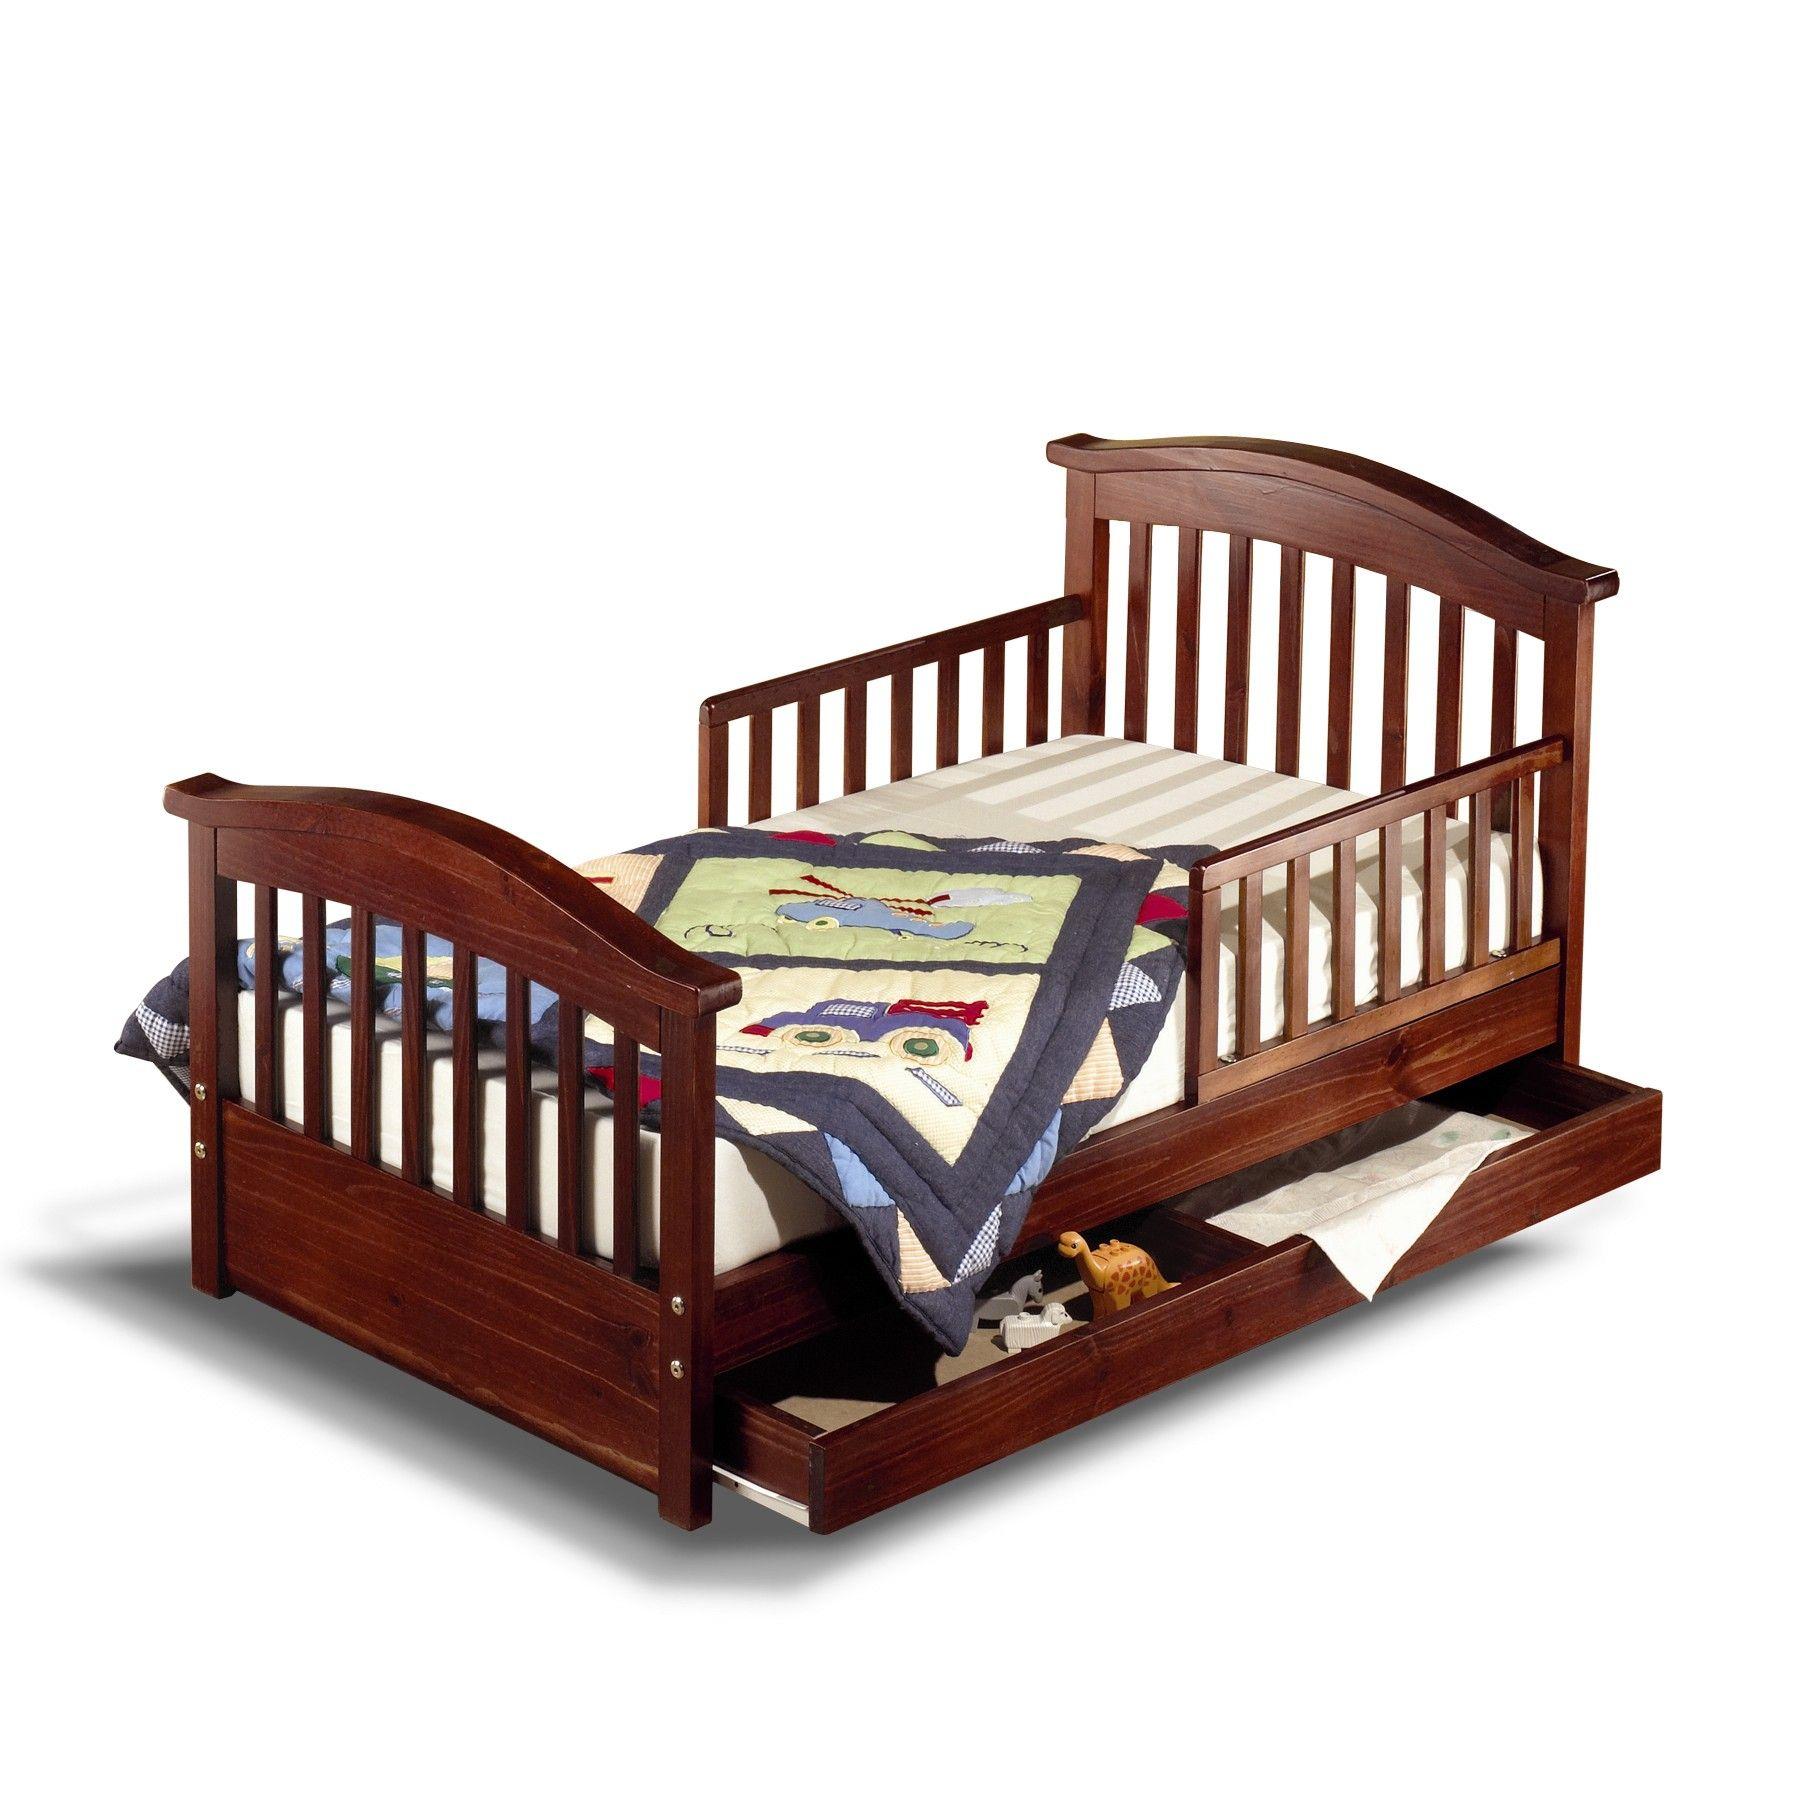 Sorelle Joel Pine Toddler Bed Finish Cherry Pine 776 Cherry Pine Kids Beds Bedroom Furniture Toddler Bed Boy Toddler Bed With Storage Kid Beds